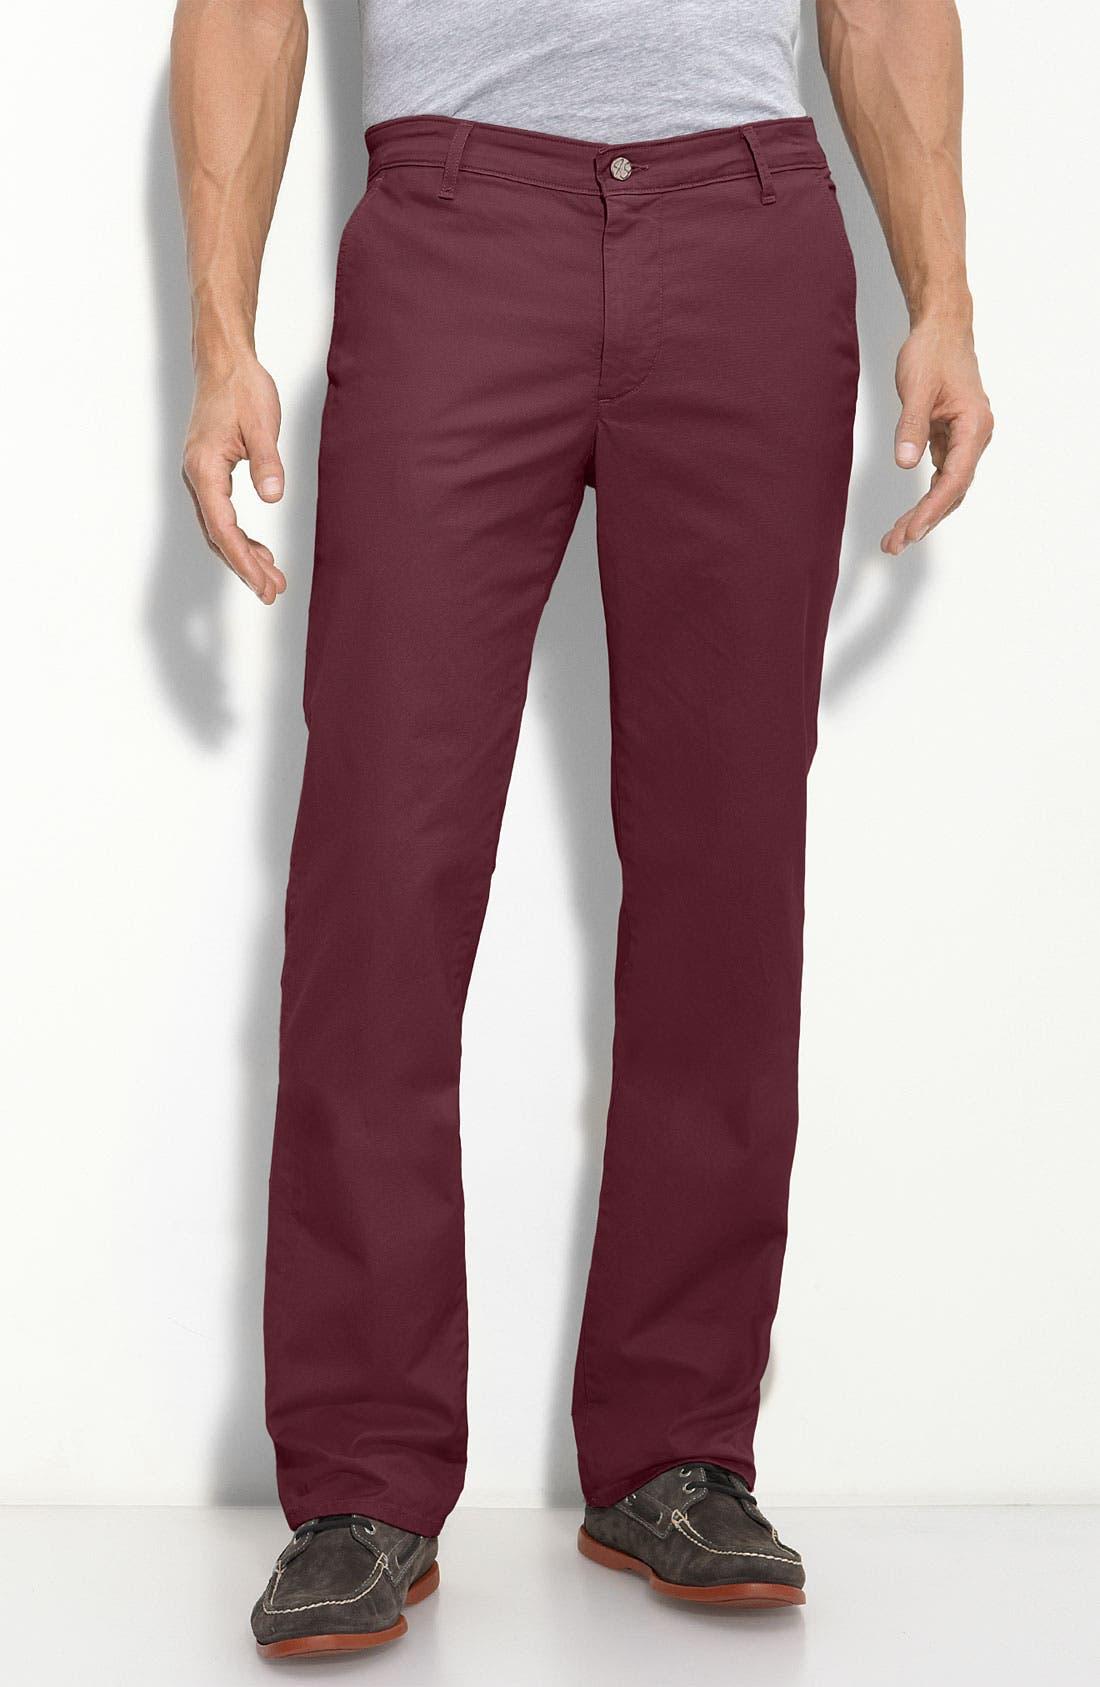 Alternate Image 1 Selected - Wallin & Bros. Sport Shirt & AG Jeans Pants